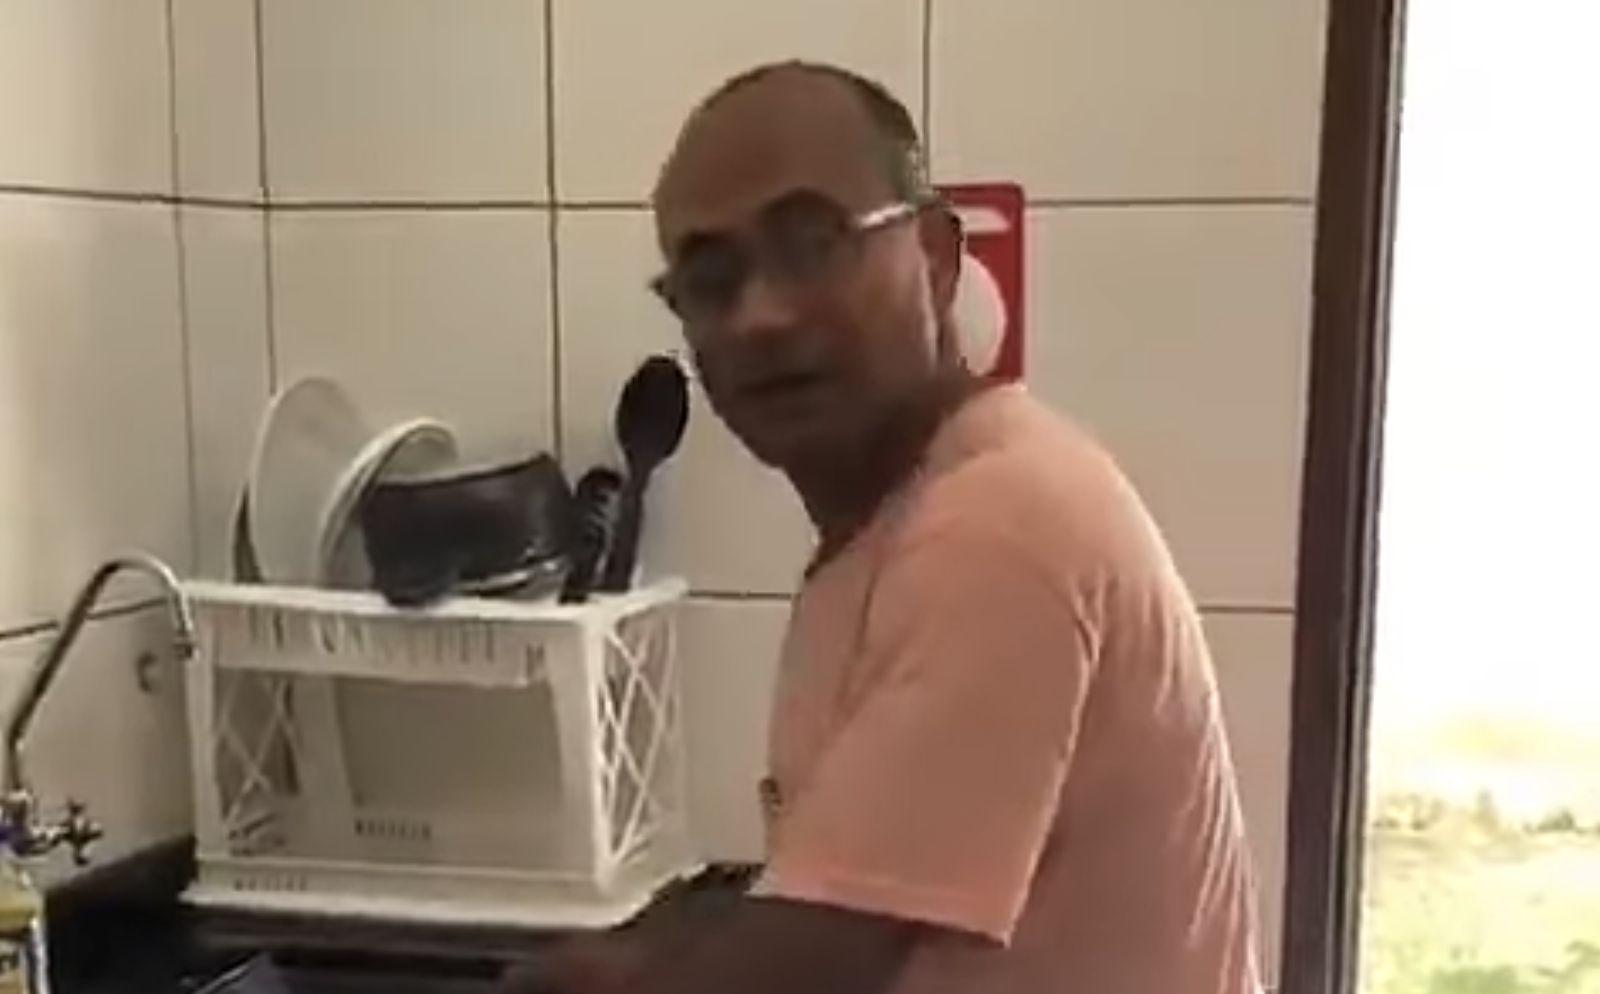 Man creates homemade treadmill amid self-isolation